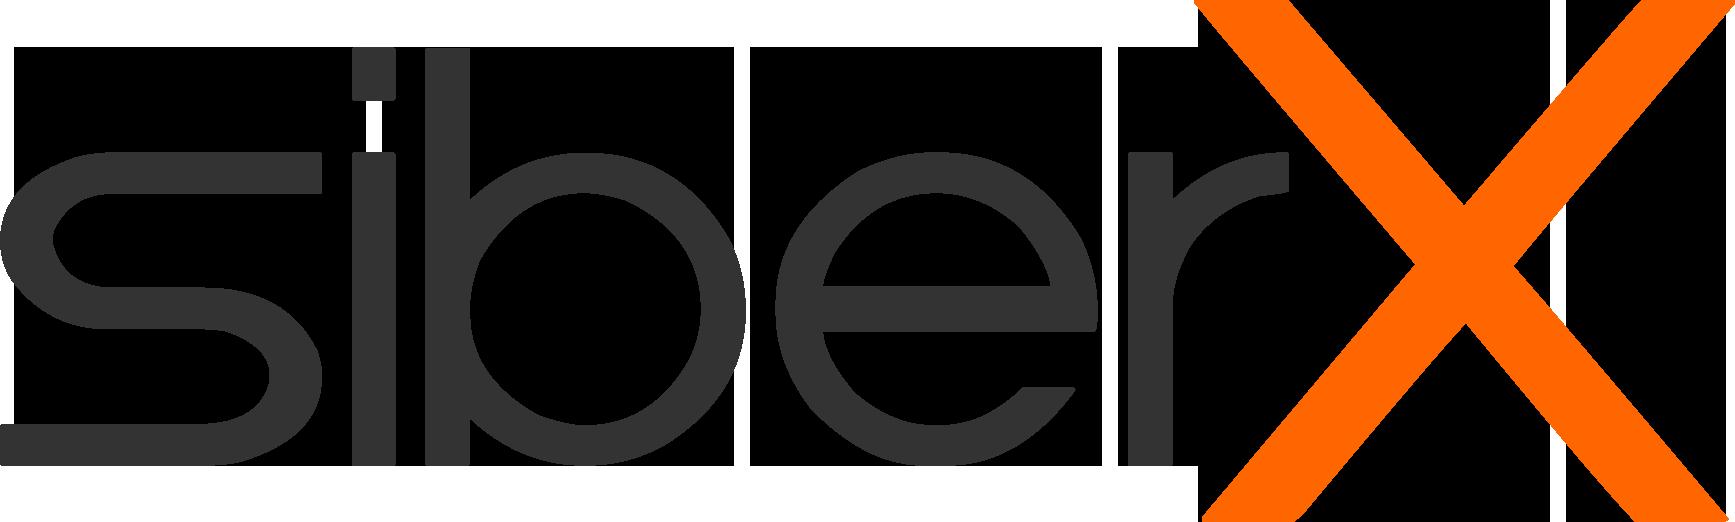 siberX Logo